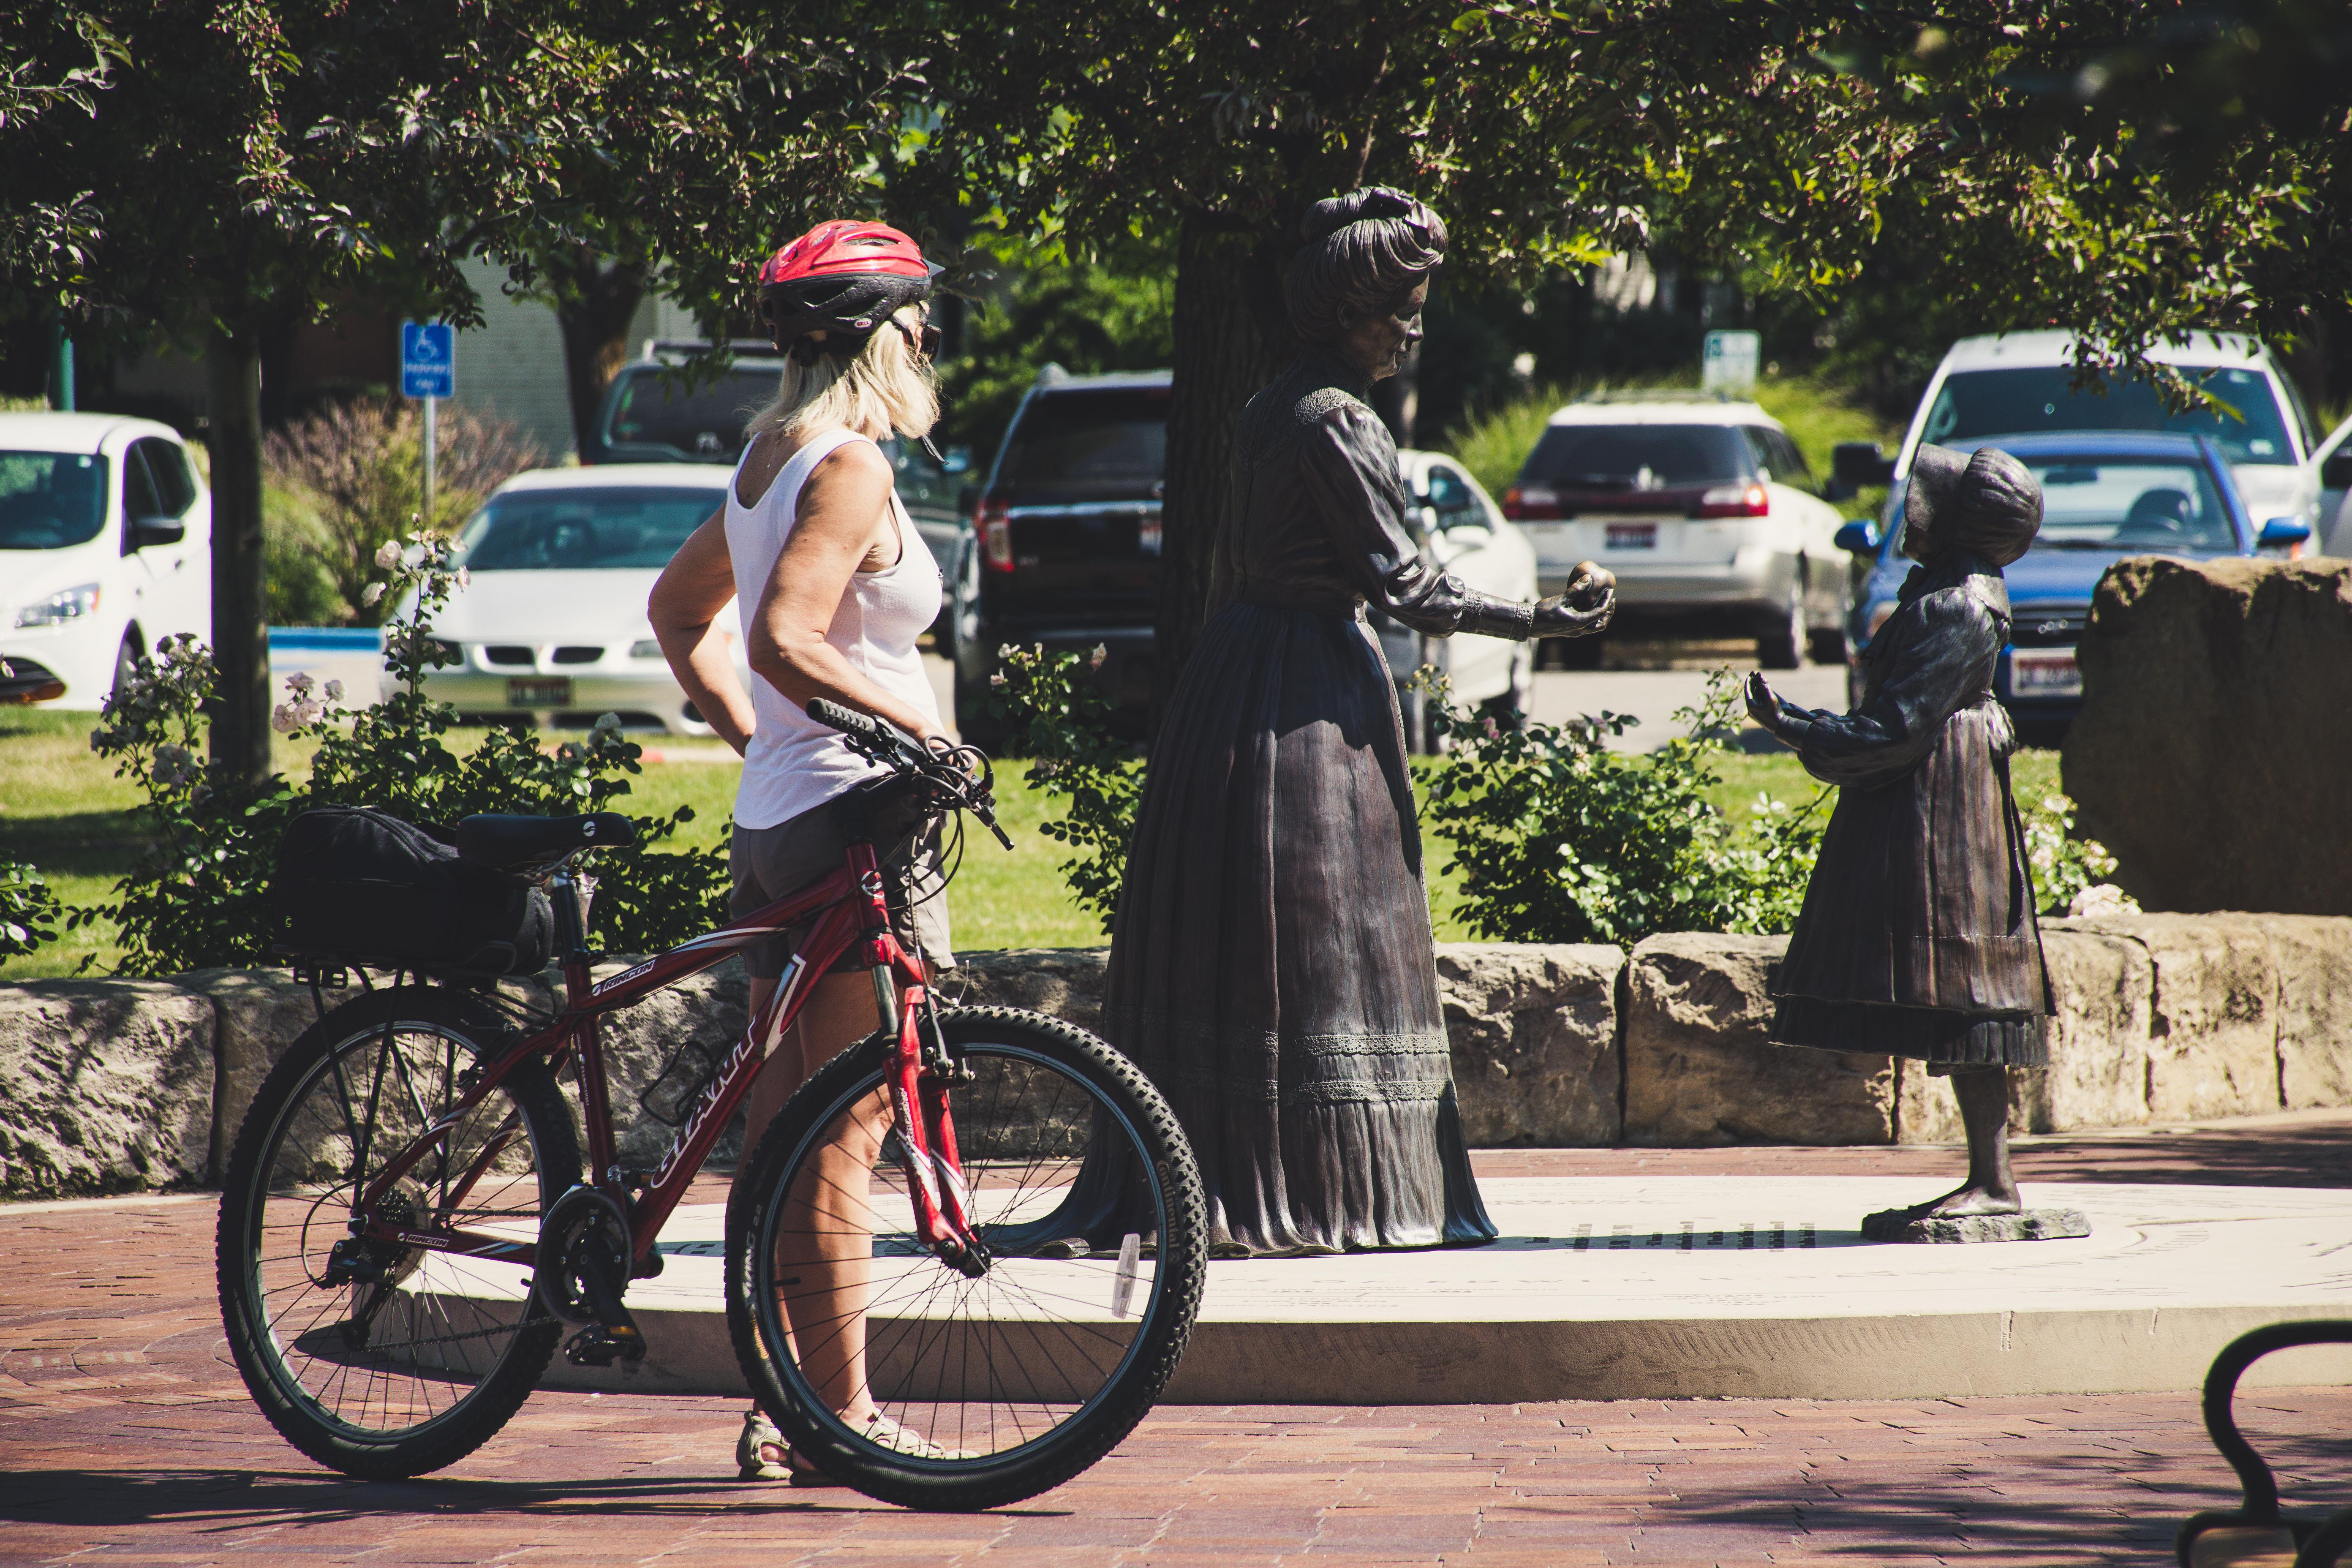 Woman Wearing White Tank Top Holding Red Hardtail Mountain Bike